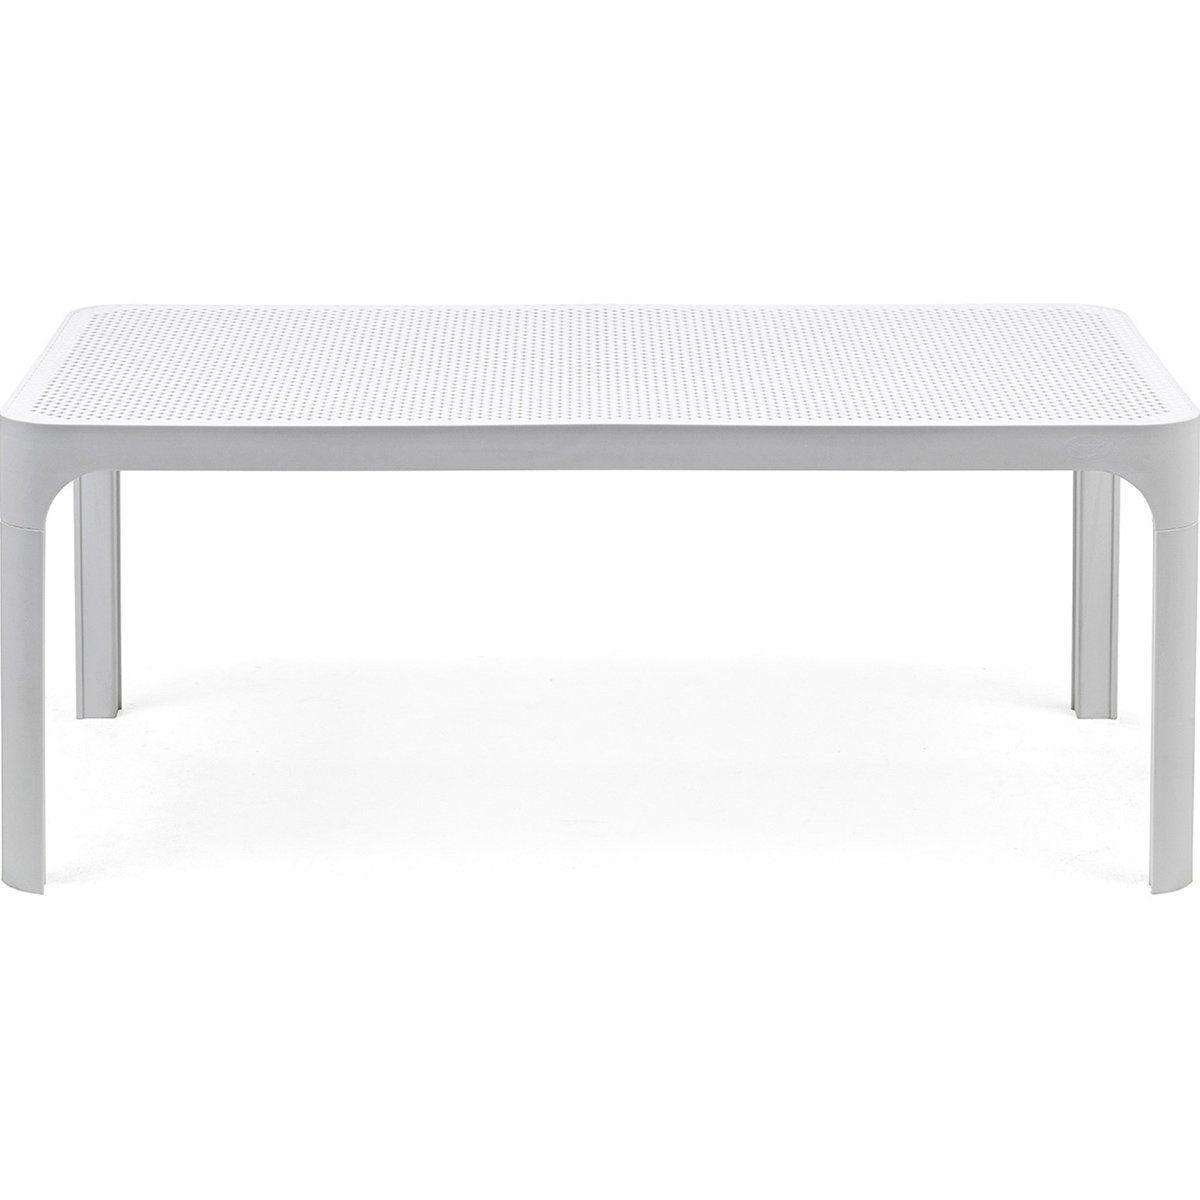 Net soffbord i vit plast från Brafab.